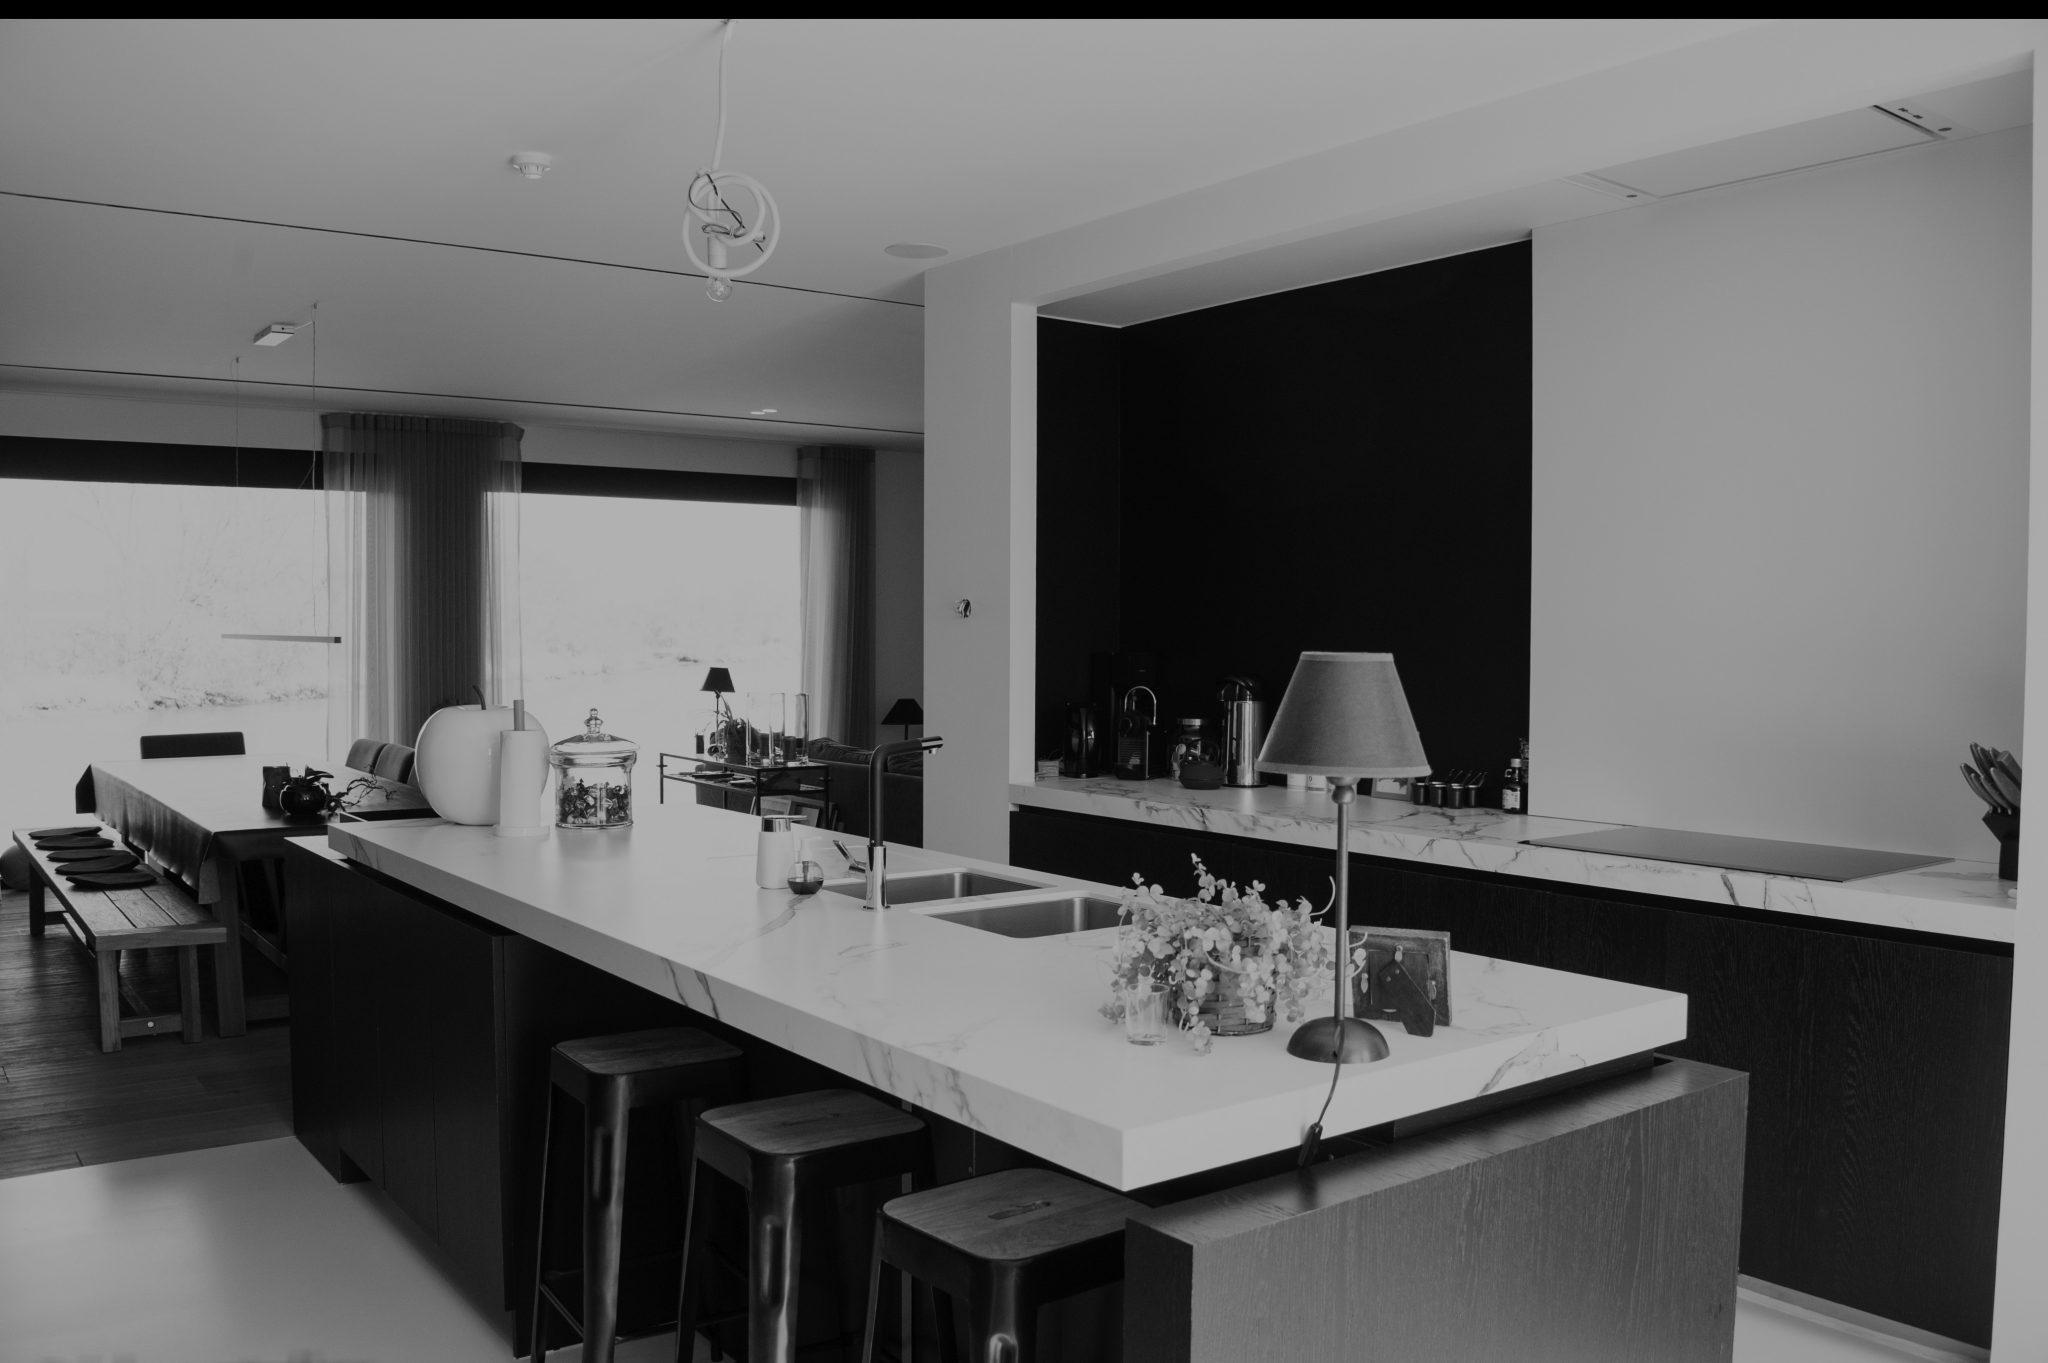 Grijze keuken idee - Tegelwand idee keuken ...